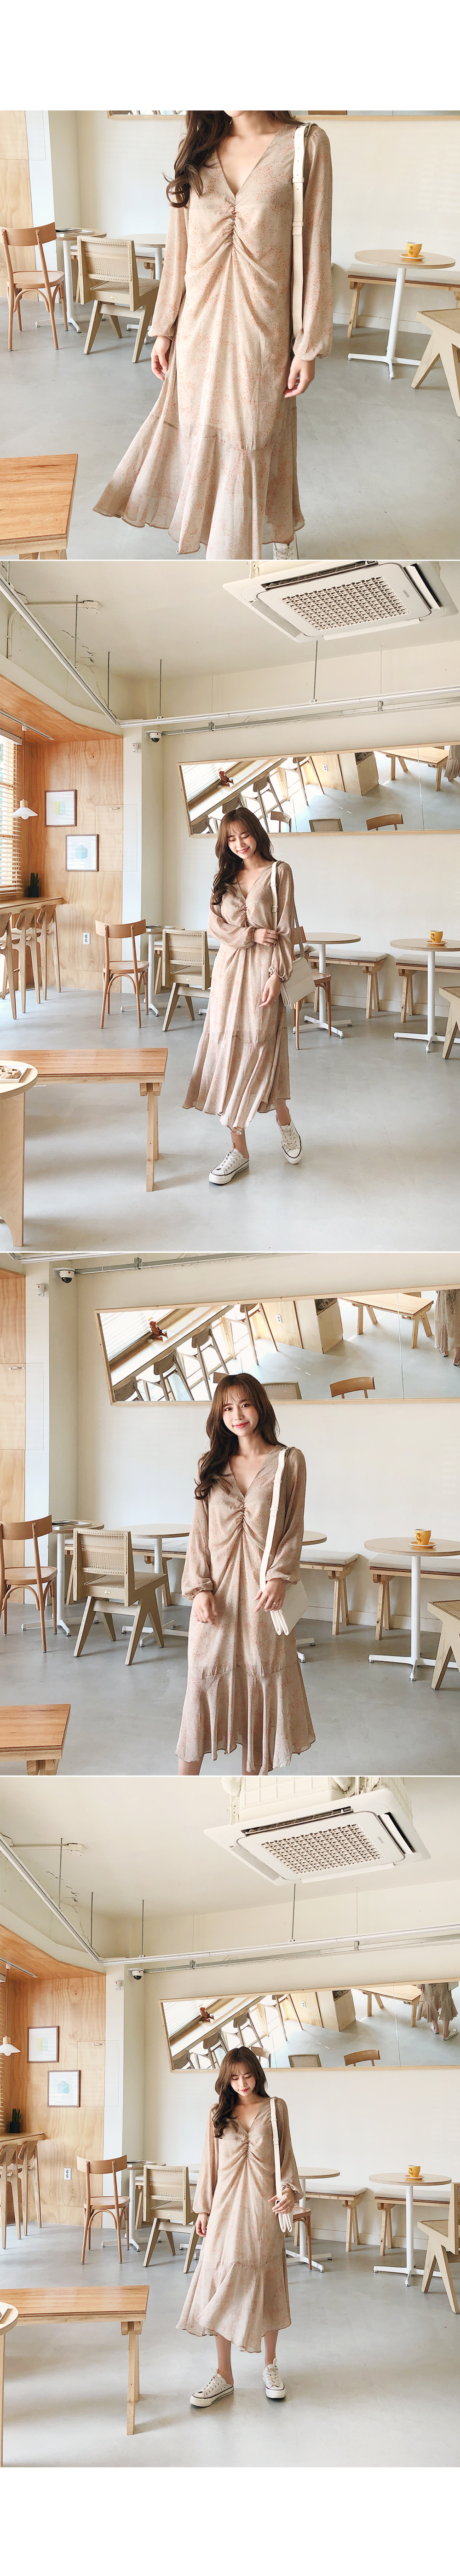 Her Sheer Dress